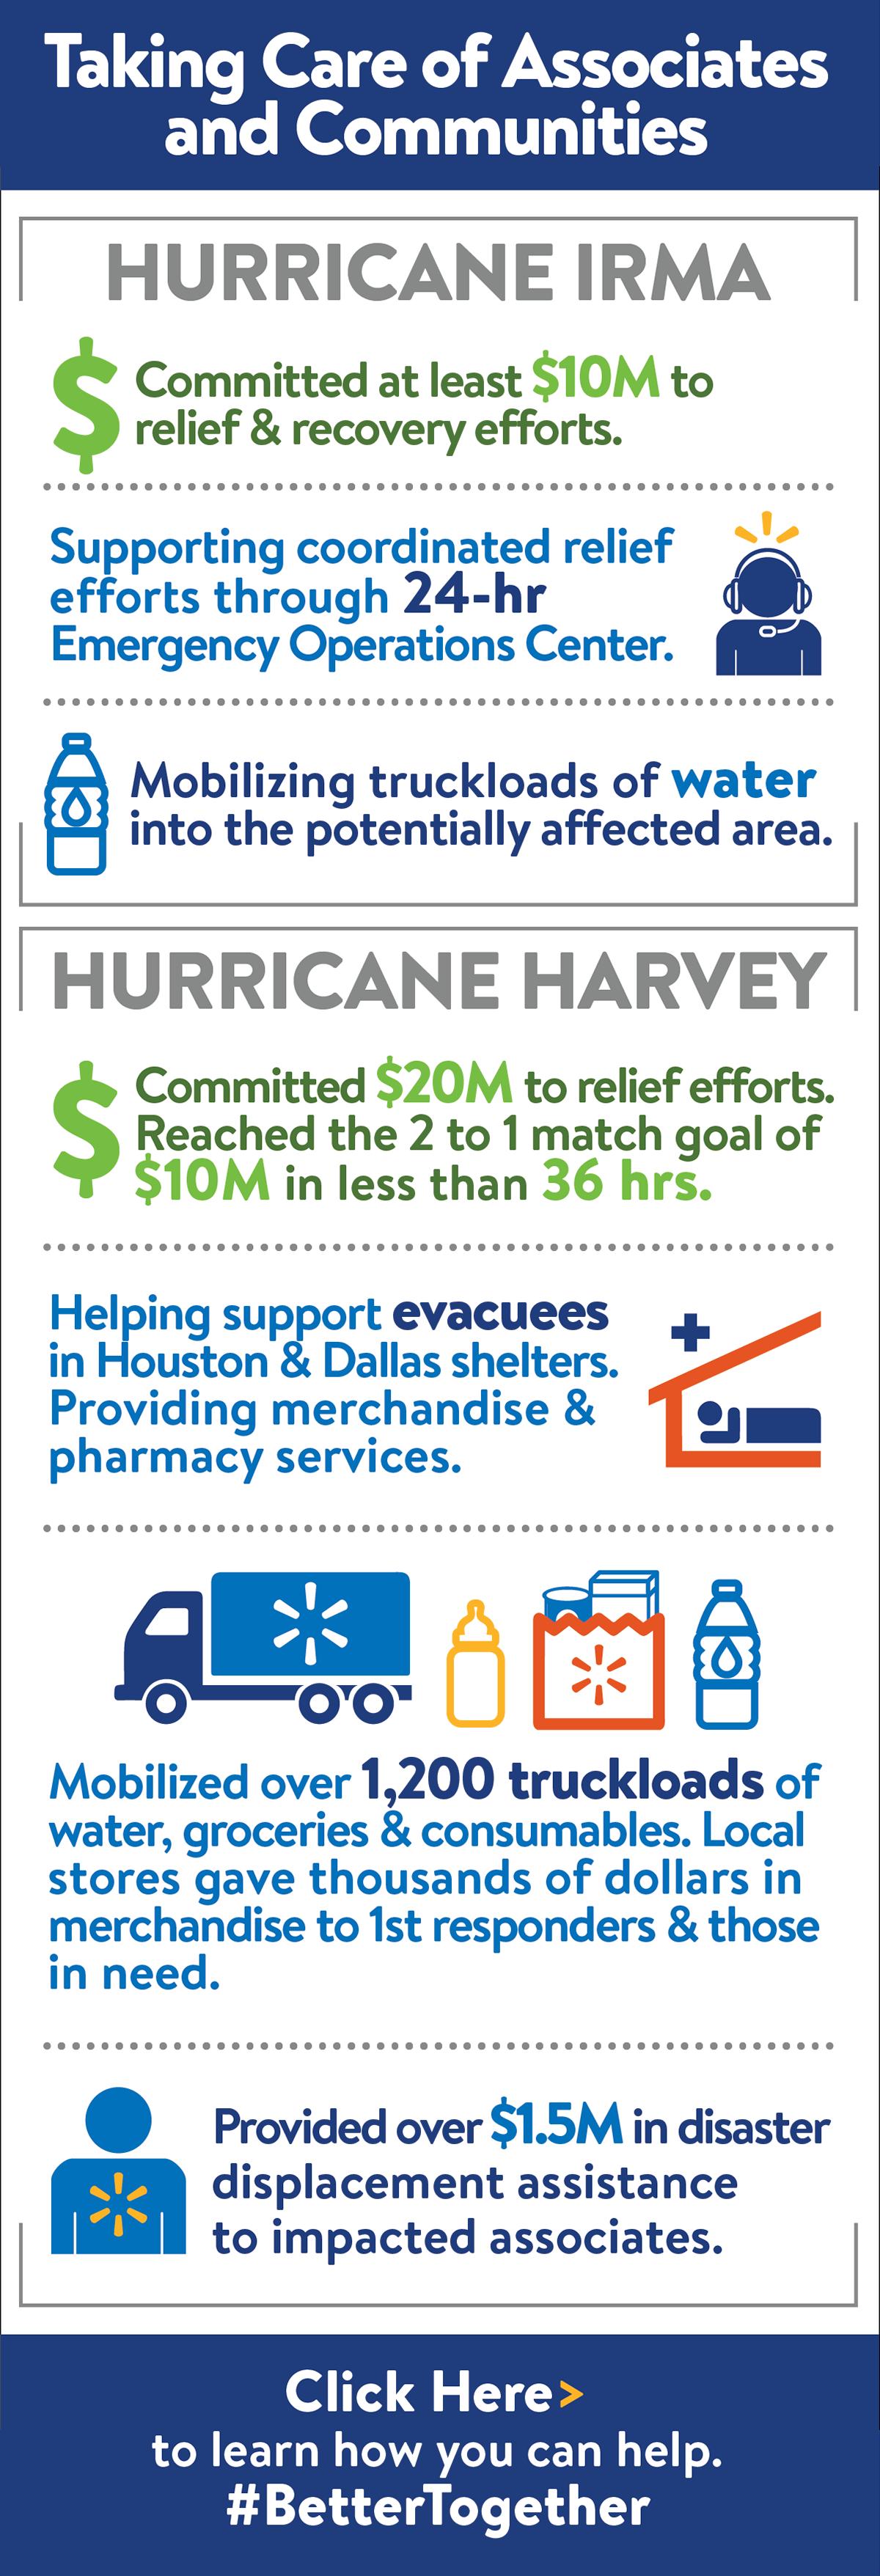 Hurricane Harvey and Irma Response